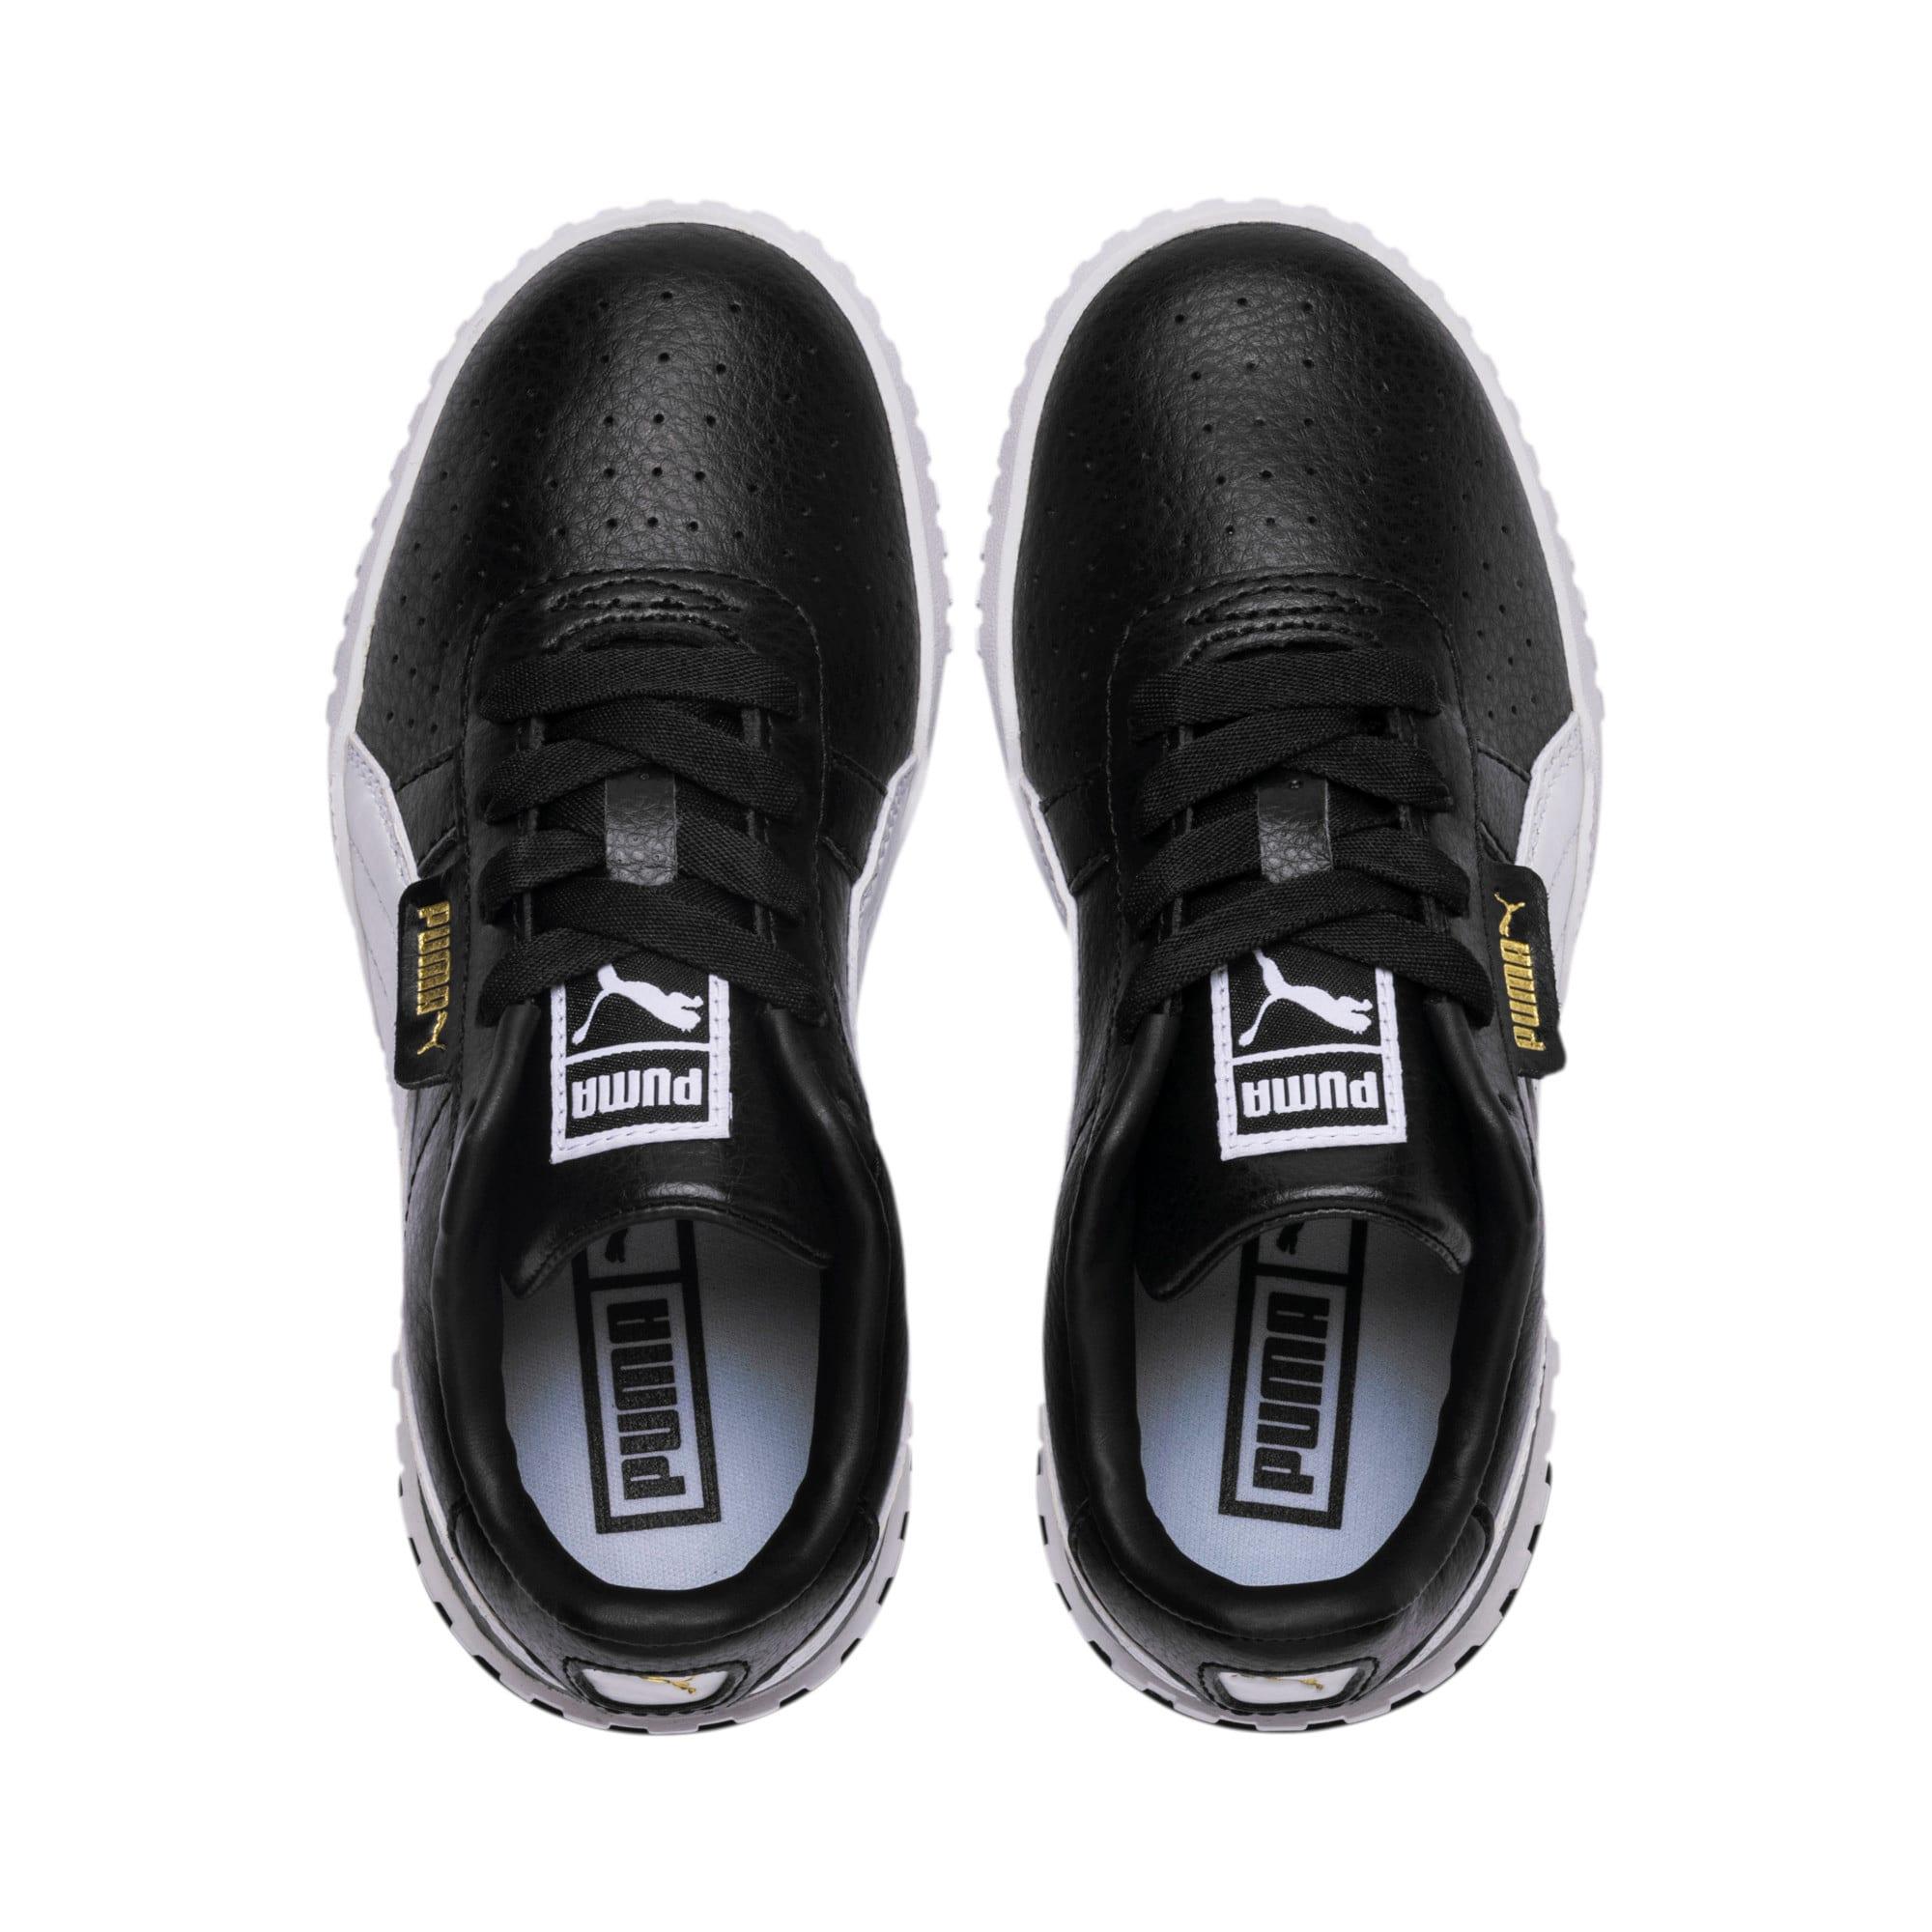 Thumbnail 6 of Cali Kids' Mädchen Sneaker, Puma Black-Puma Team Gold, medium